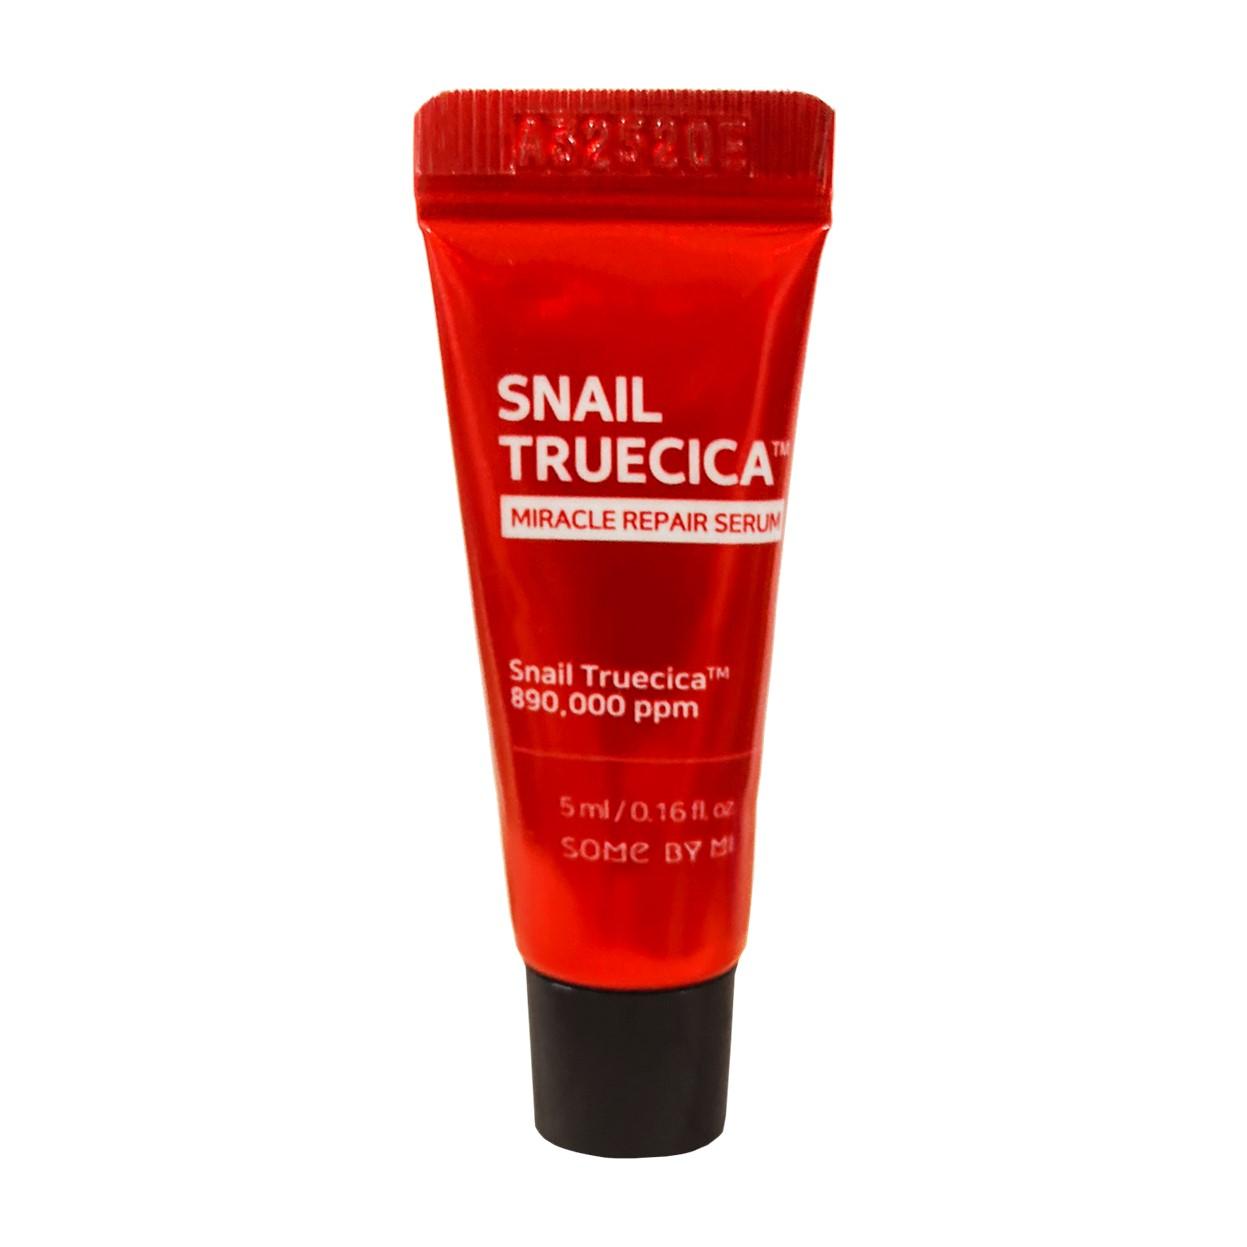 Tinh chất Some By Mi Snail Truecica Miracle Repair Serum Mini 5ml